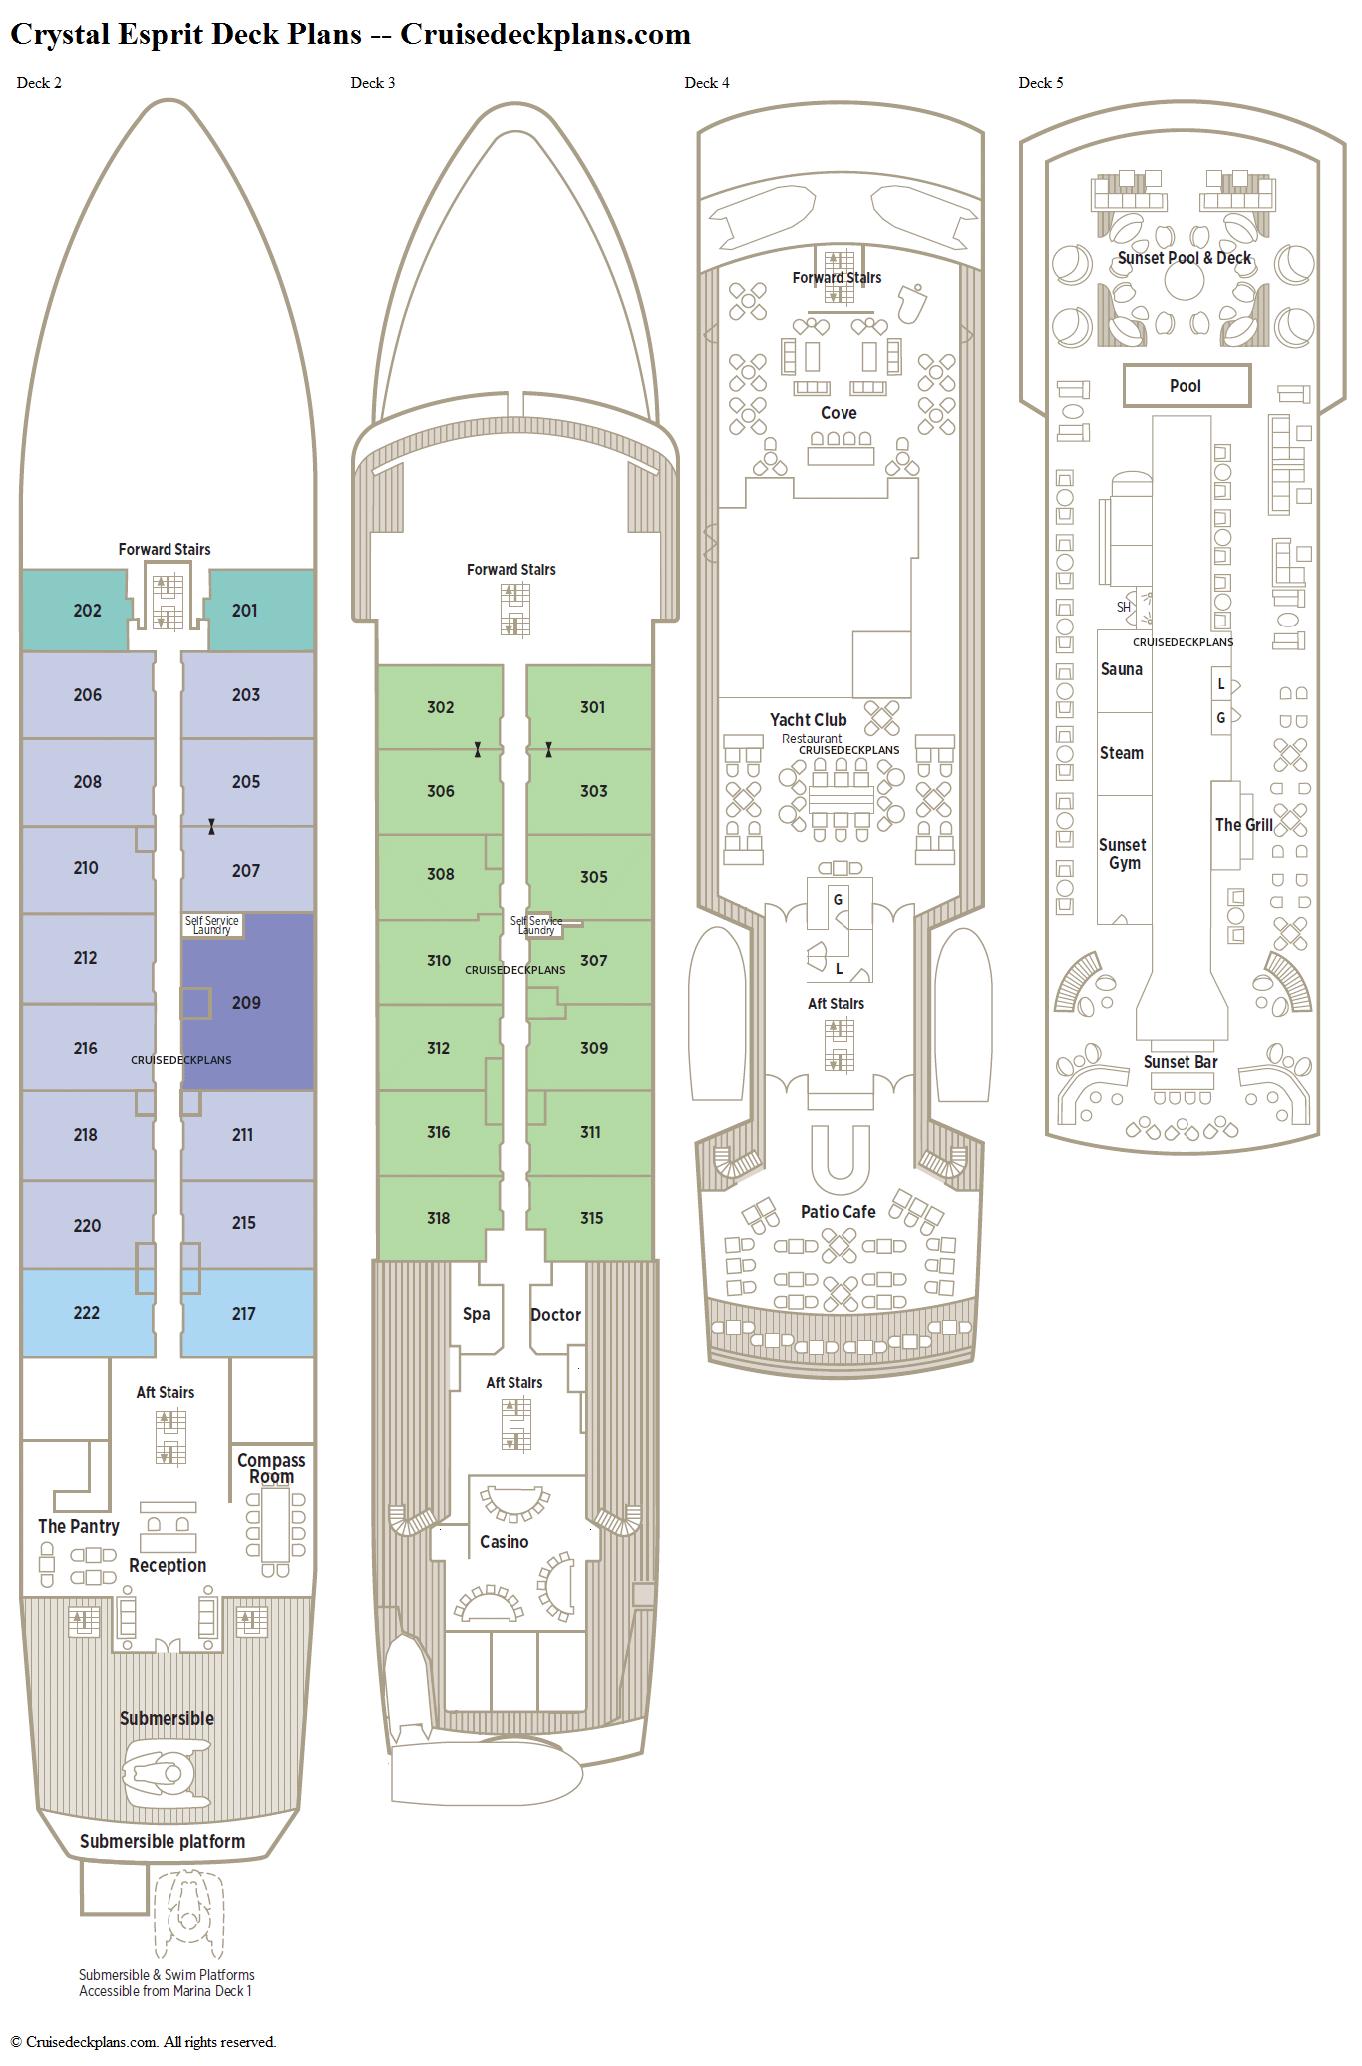 Crystal Esprit Deck 3 Deck Plan Tour